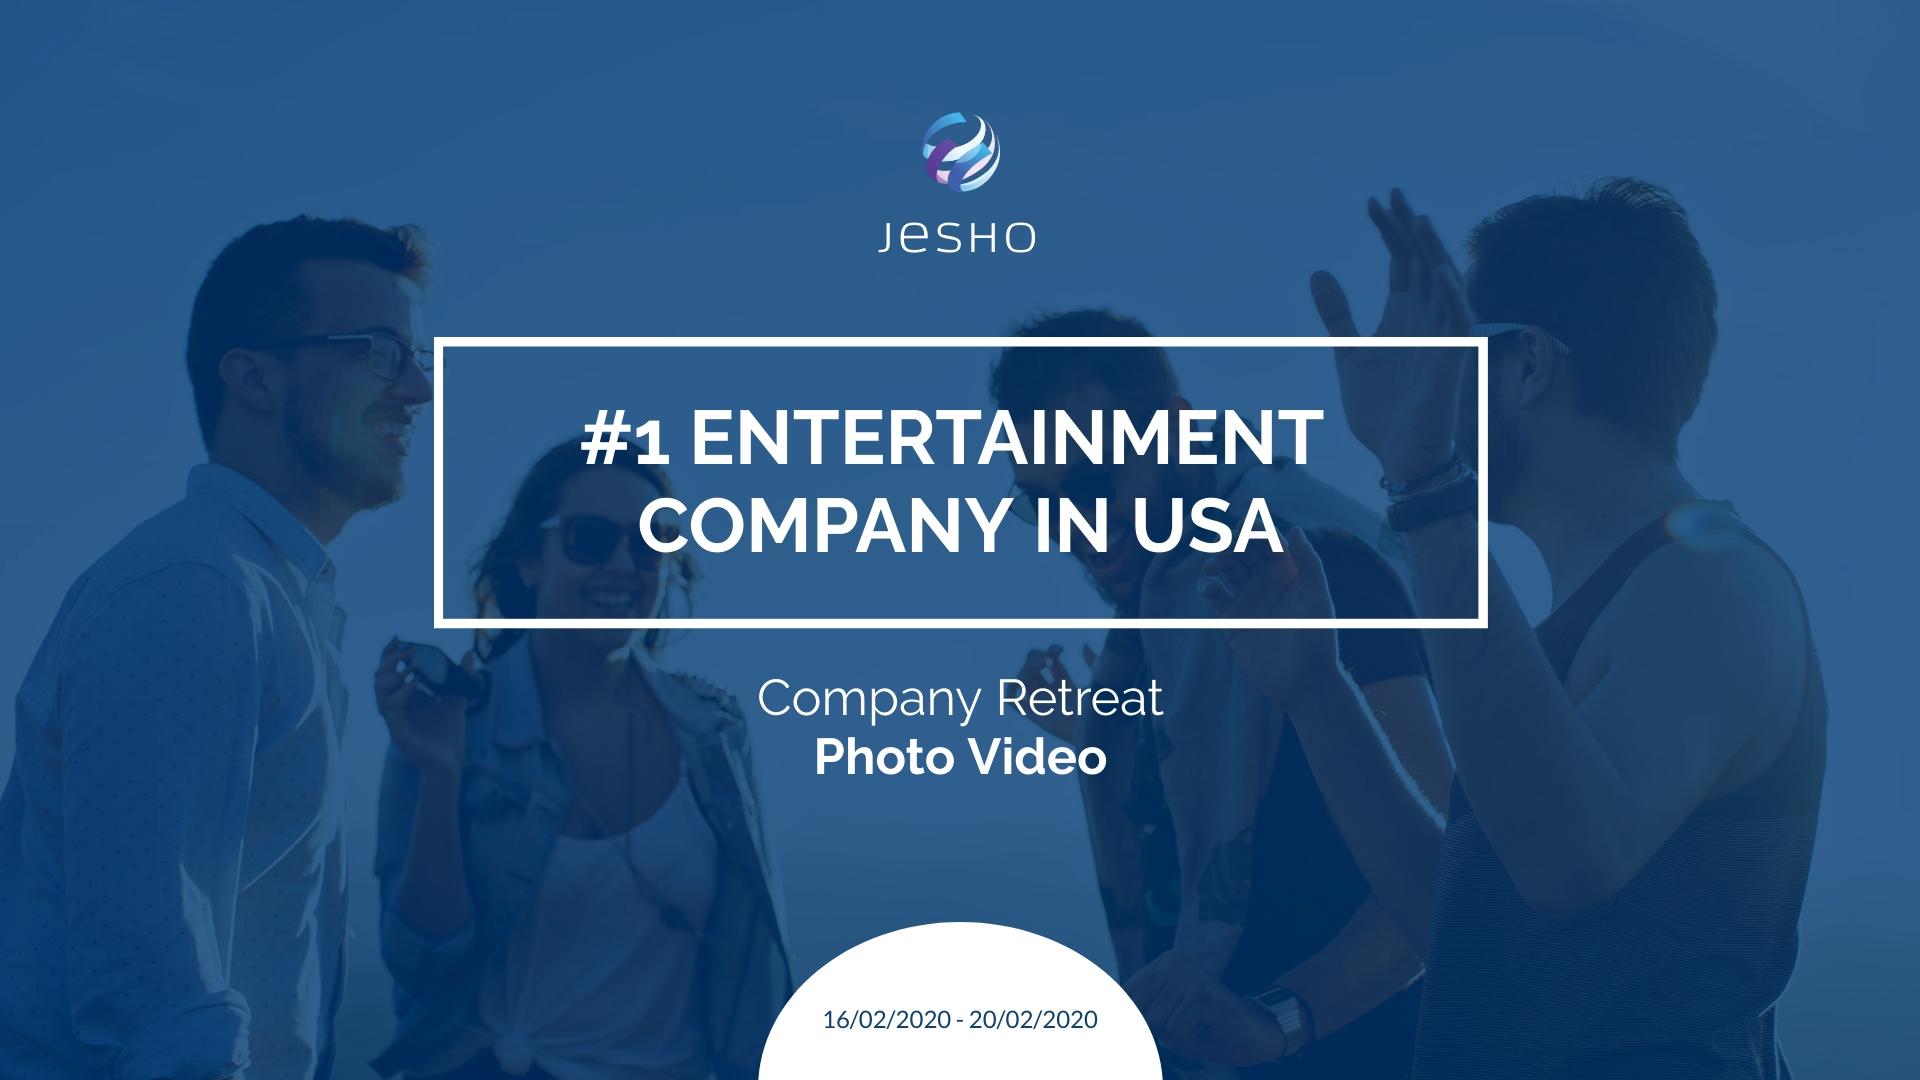 Company Retreat - Photo Video Template